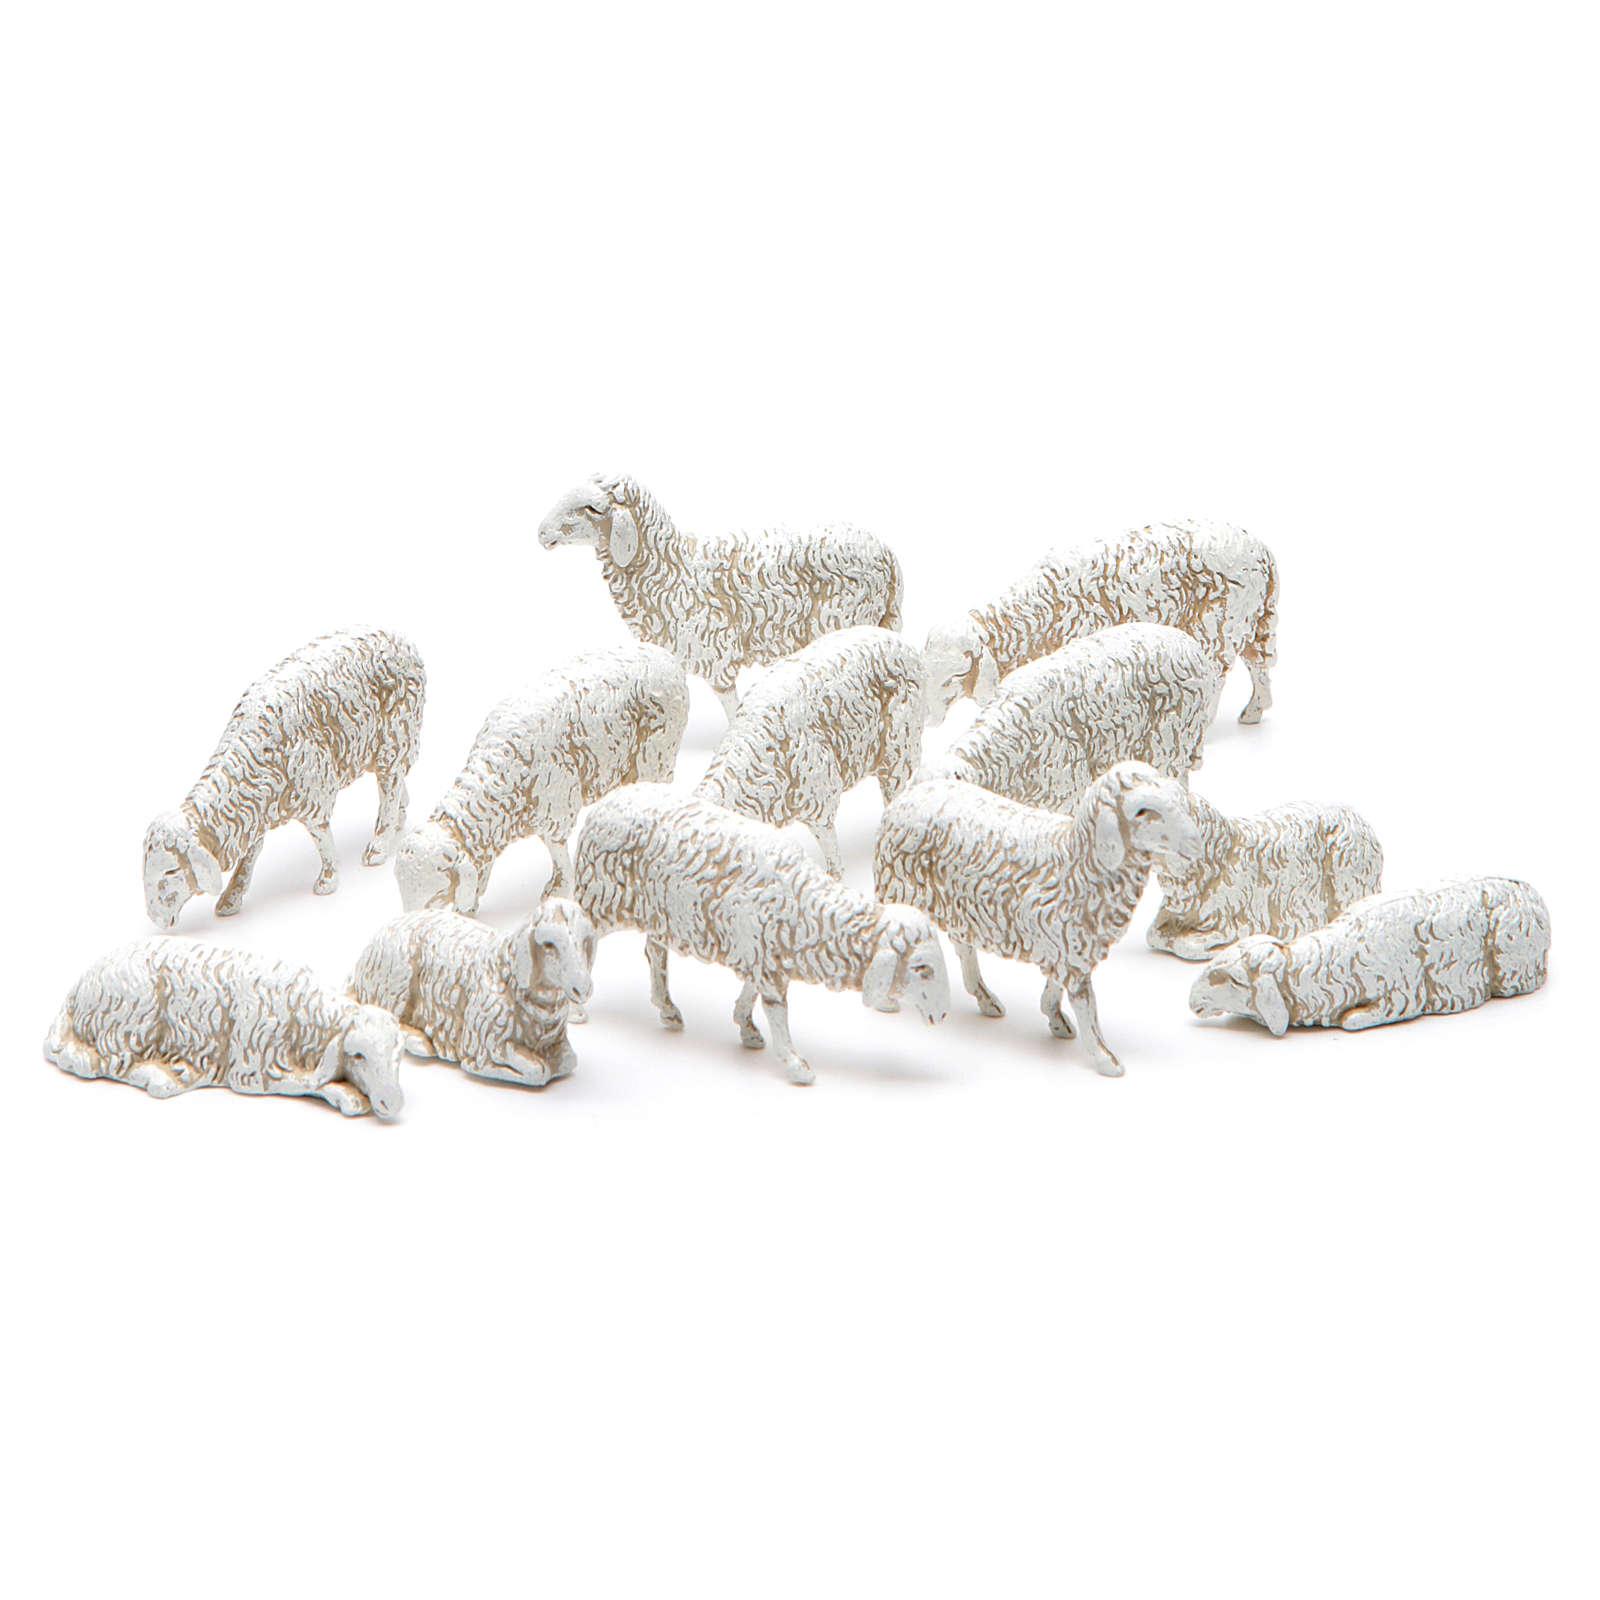 Moutons assortis 10 cm crèche Moranduzzo 12 pcs 4